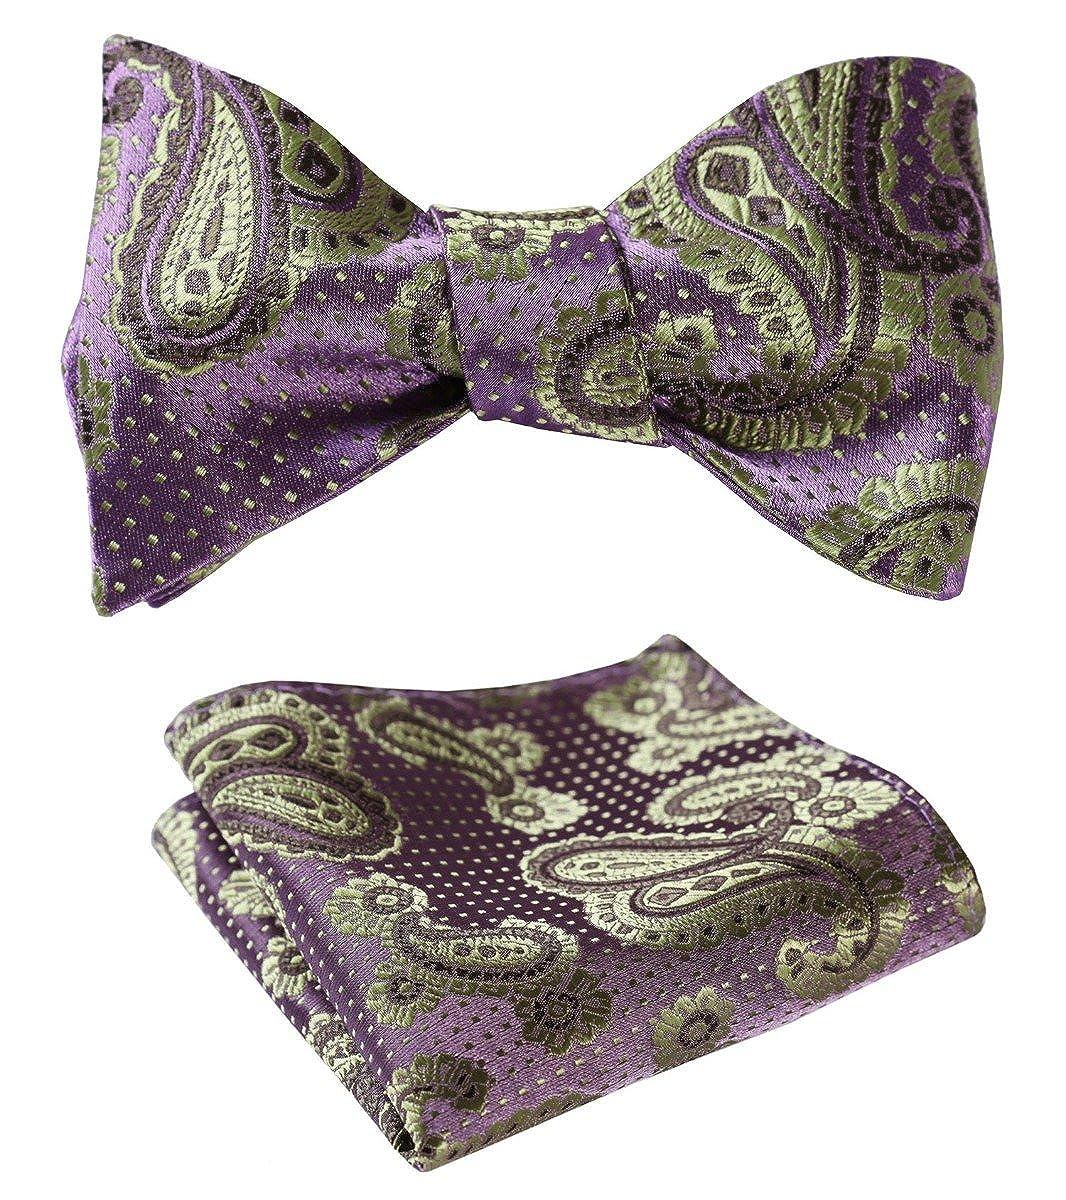 Green BIYINI Mens Paisley Floral Jacquard Woven Wedding Party Self Bow Tie Set Purple